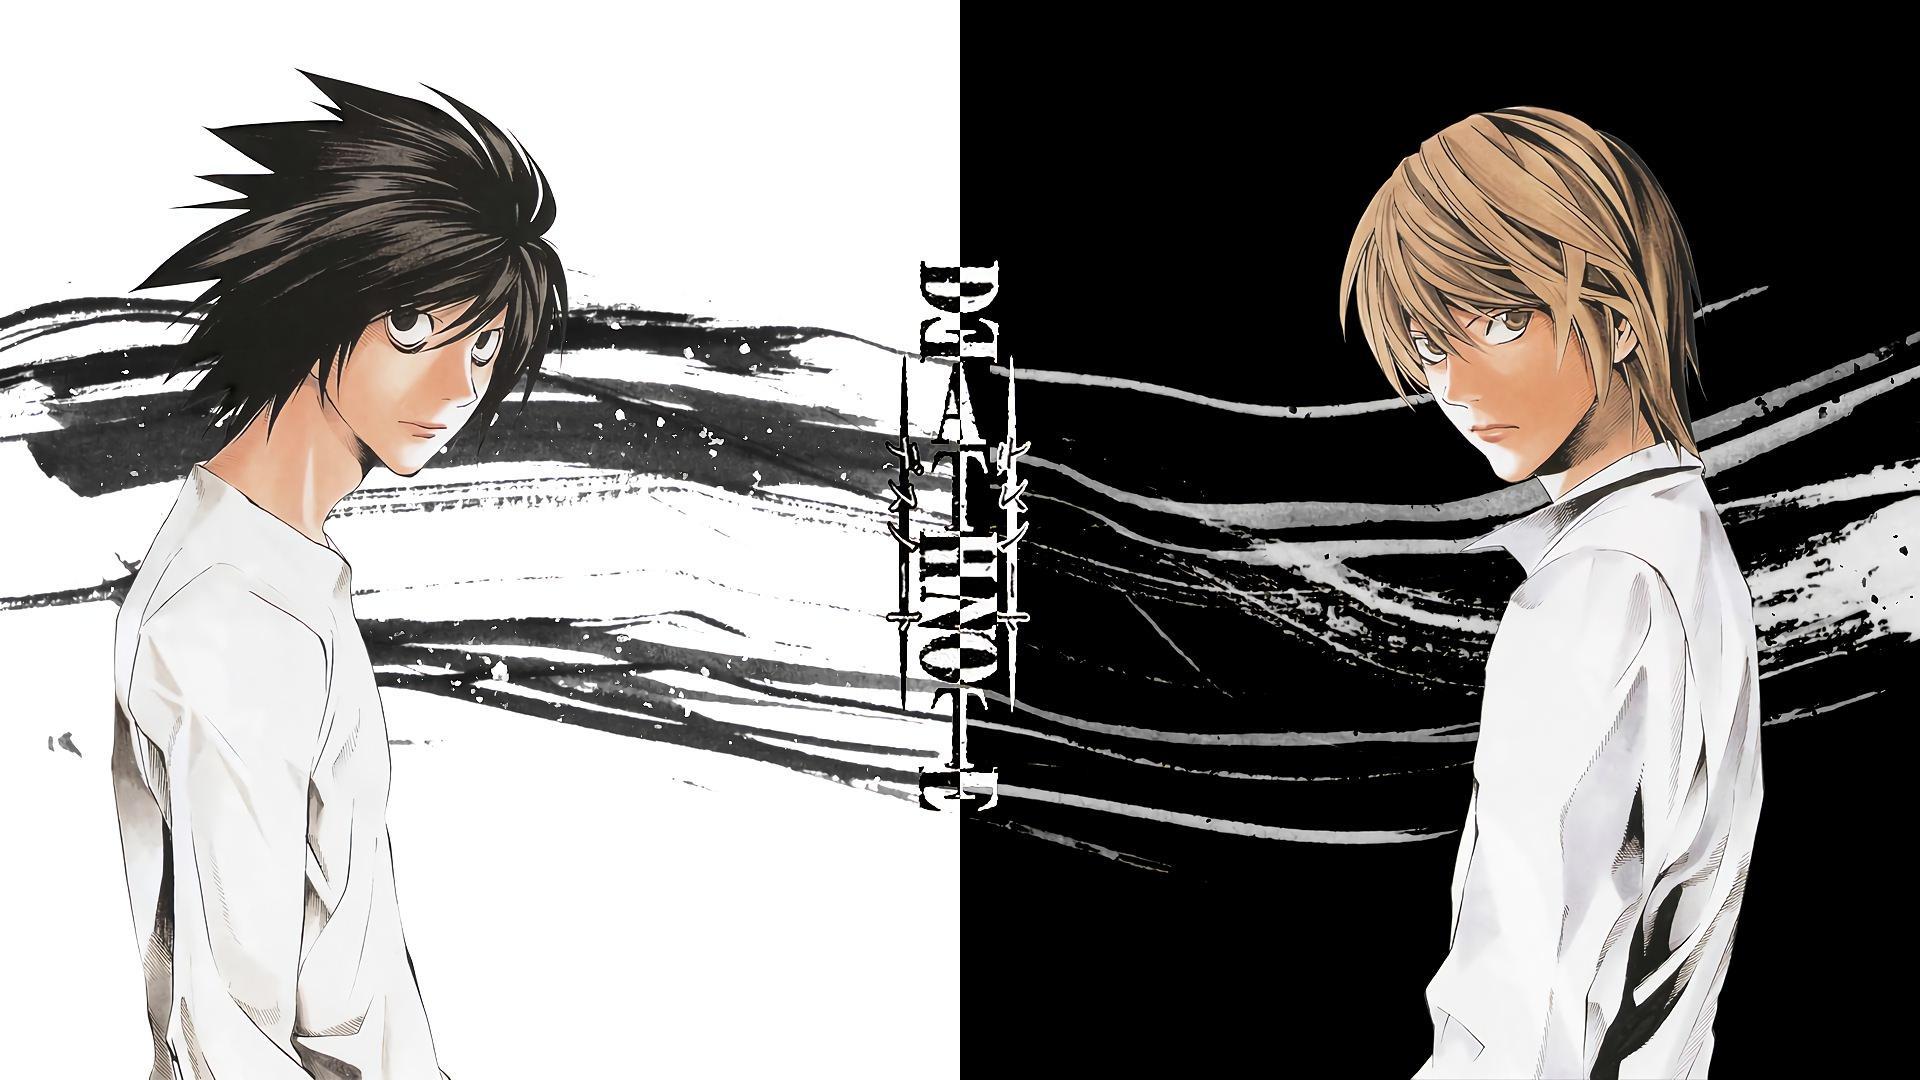 1920x1080 L and Light Death Note hình nền